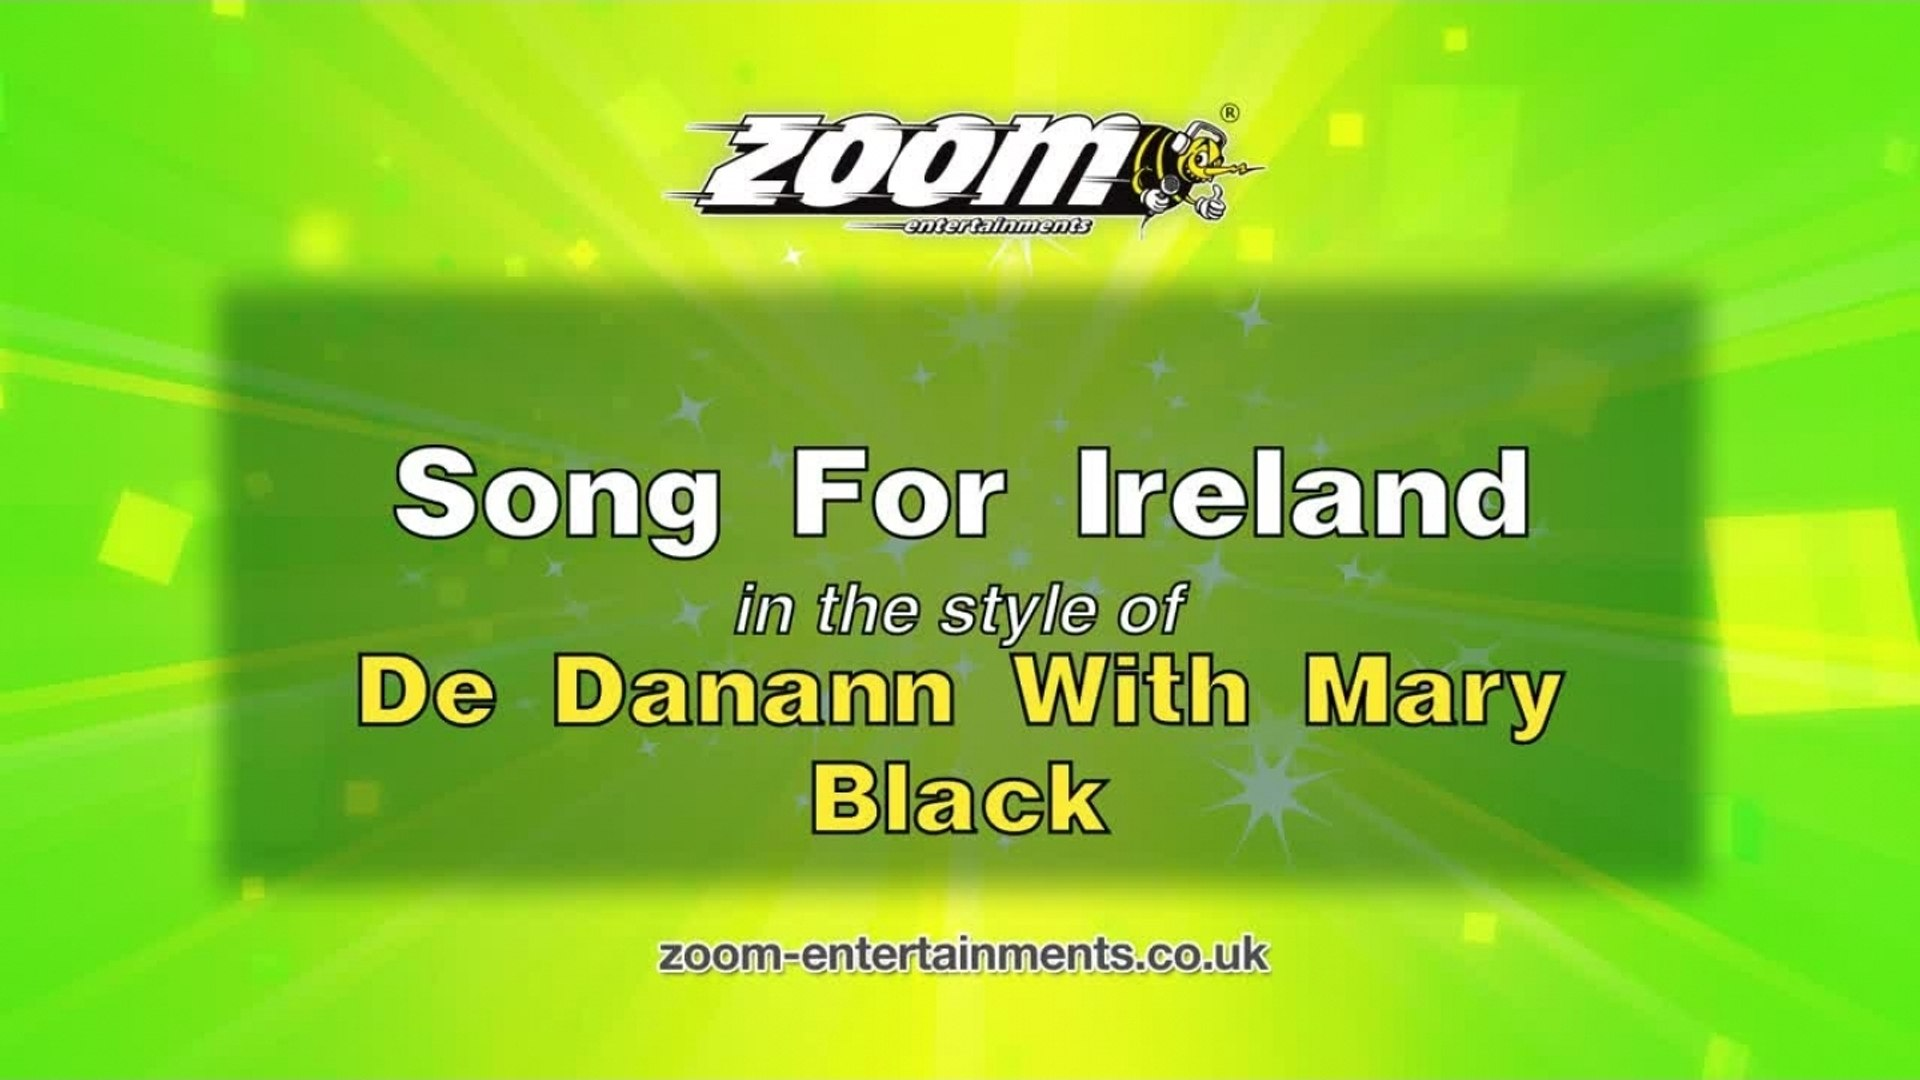 Zoom Karaoke - Song For Ireland - De Danann With Mary Black